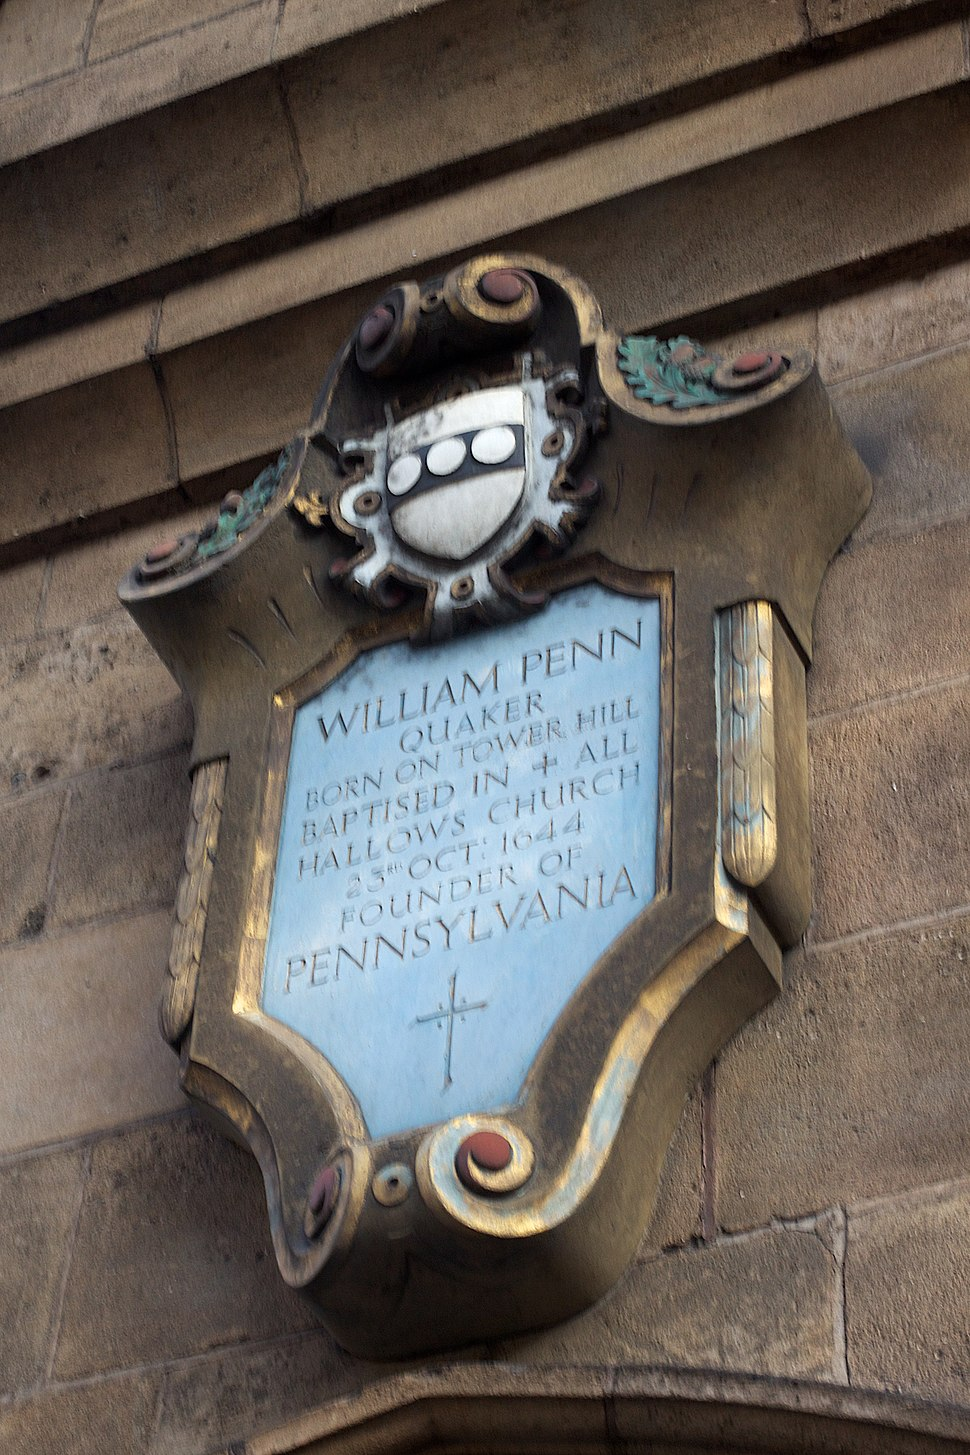 William Penn memorial